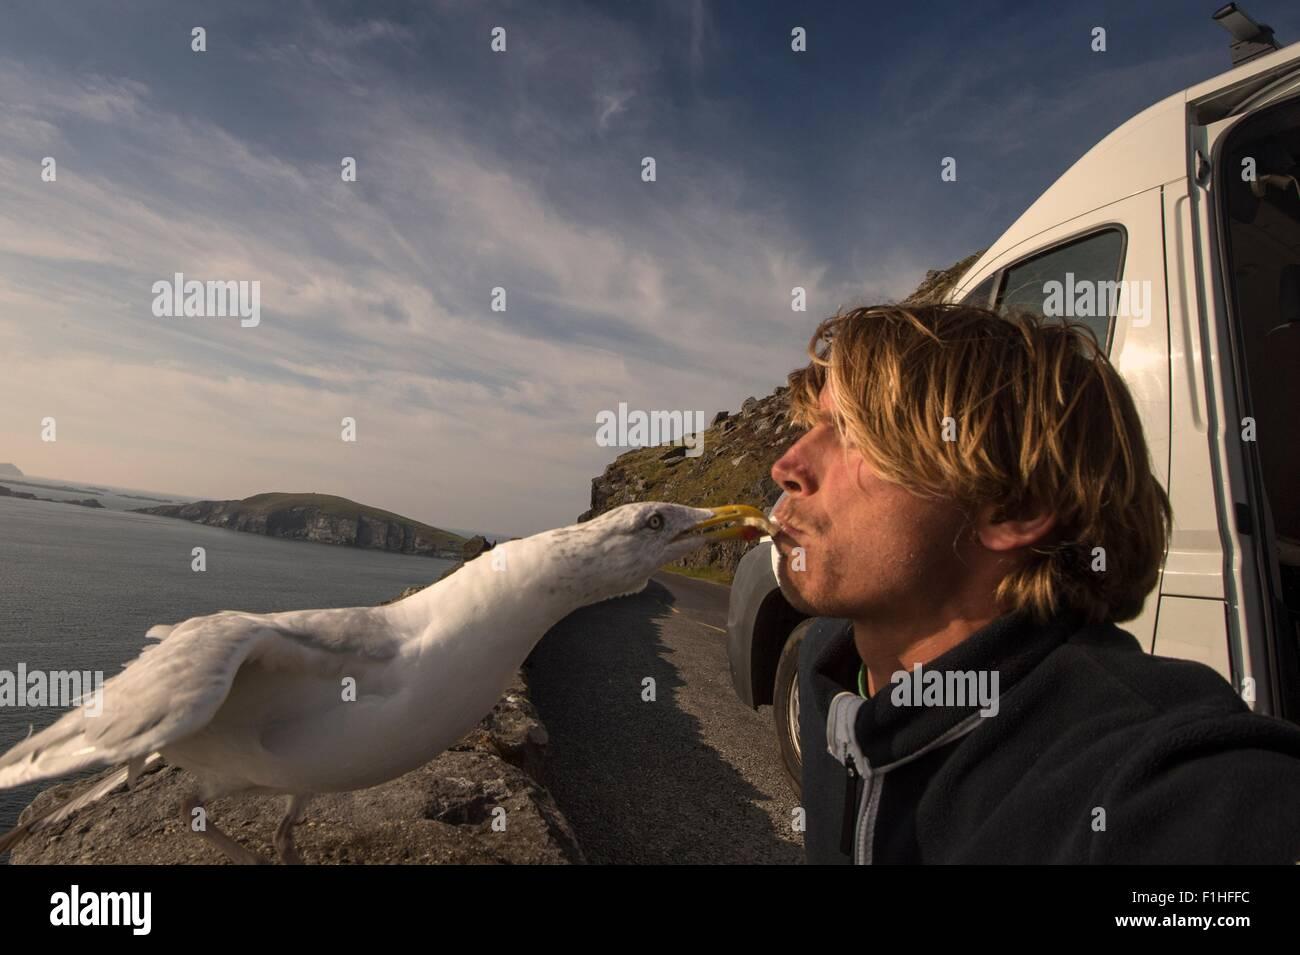 Bird taking food from man's mouth, Slea head,County Kerry, Ireland Stock Photo